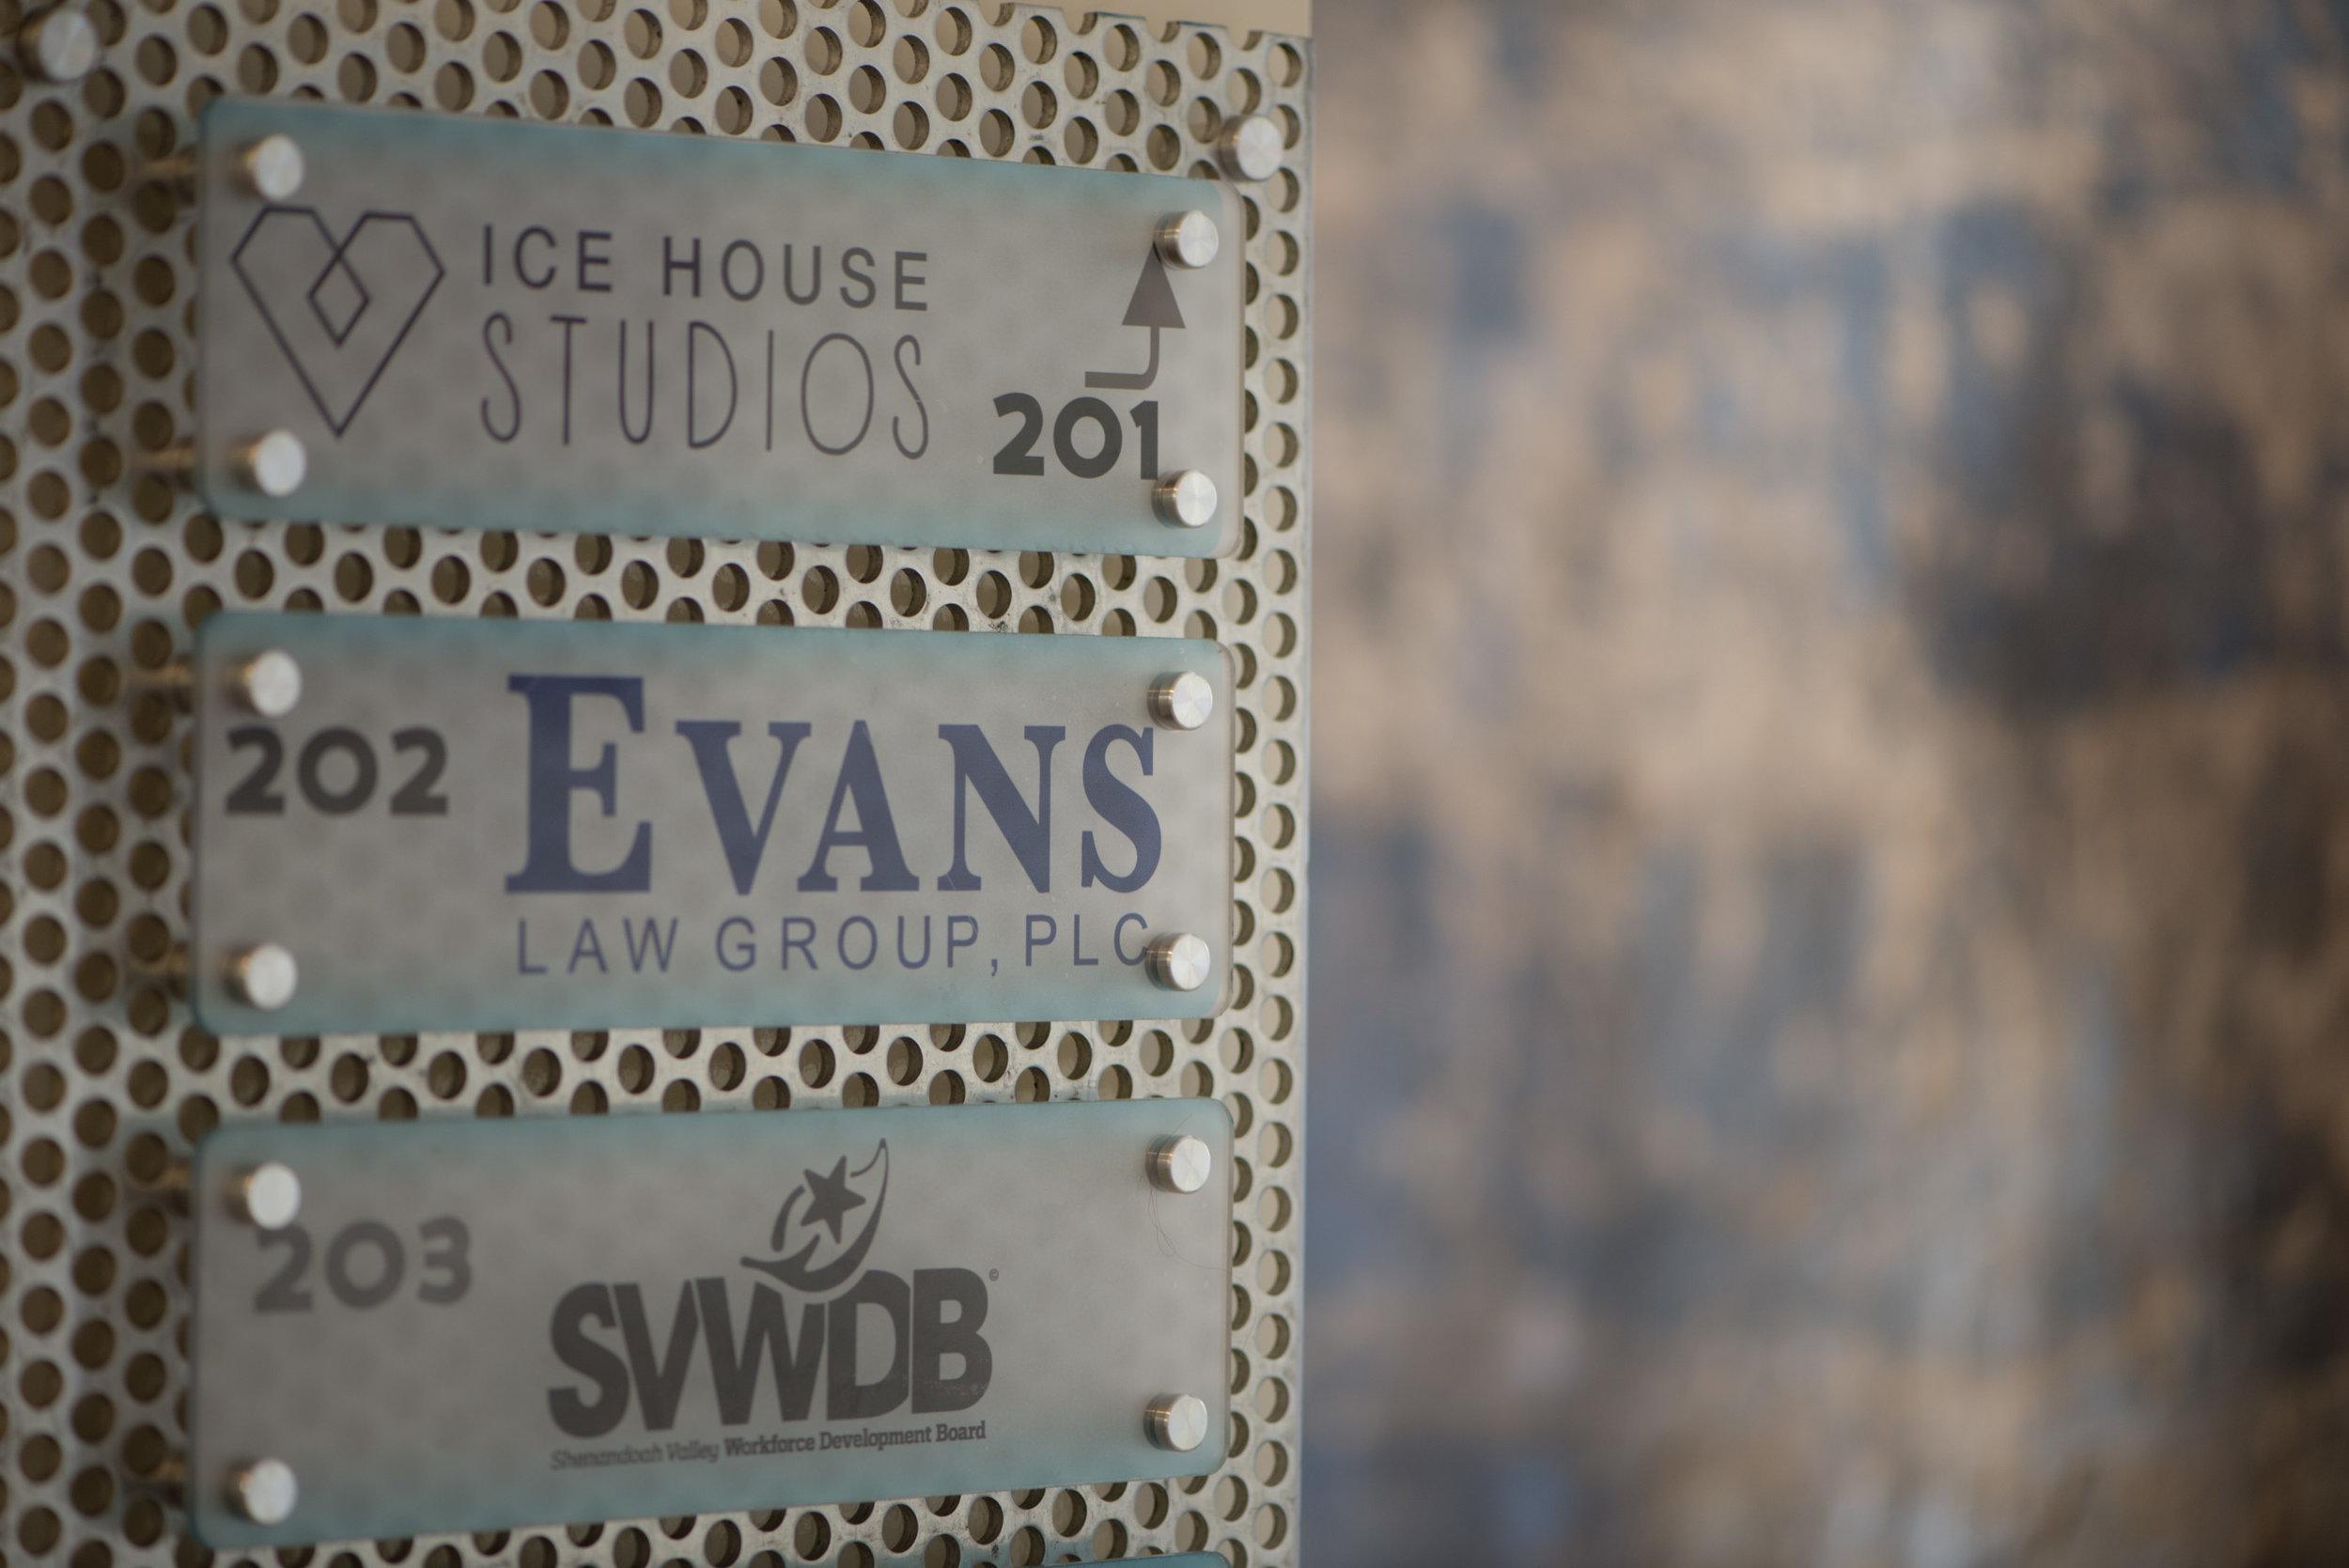 Evans Law Group Sign.jpg